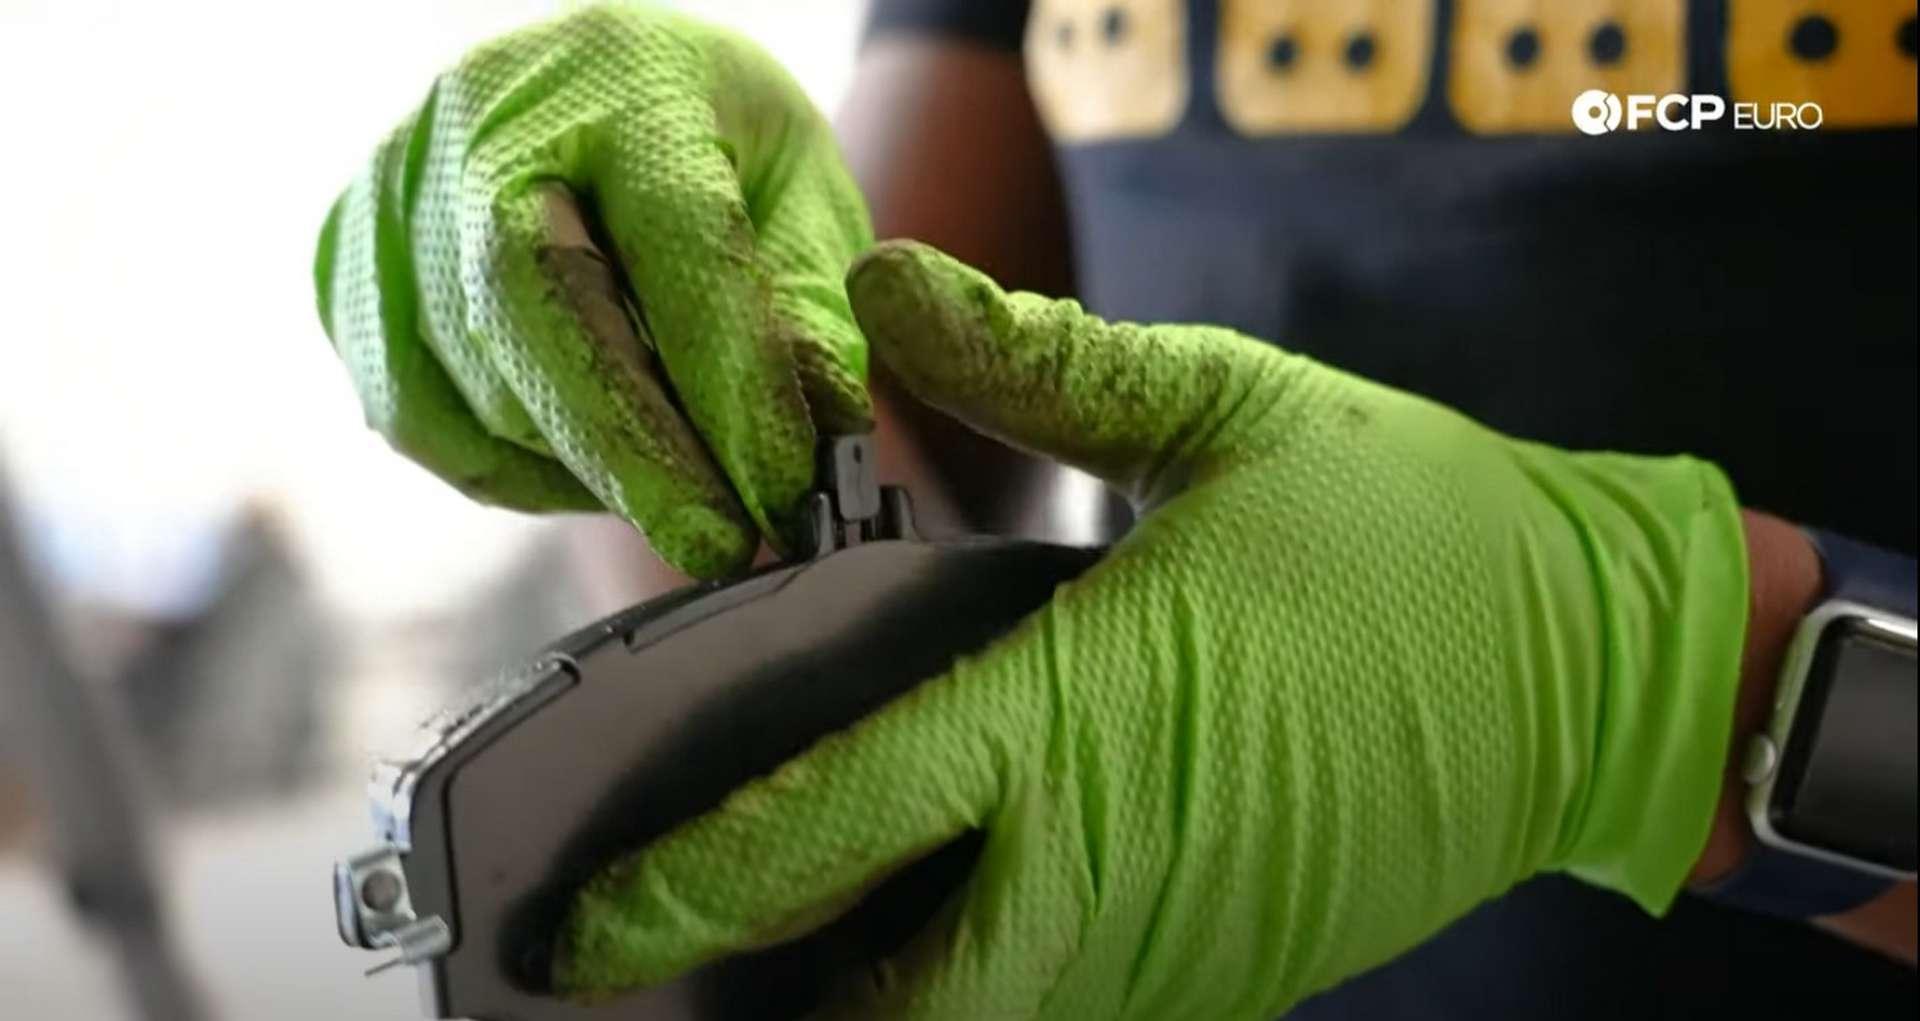 DIY Mercedes-Benz W205 Front Brake Service installing the new pad wear sensor